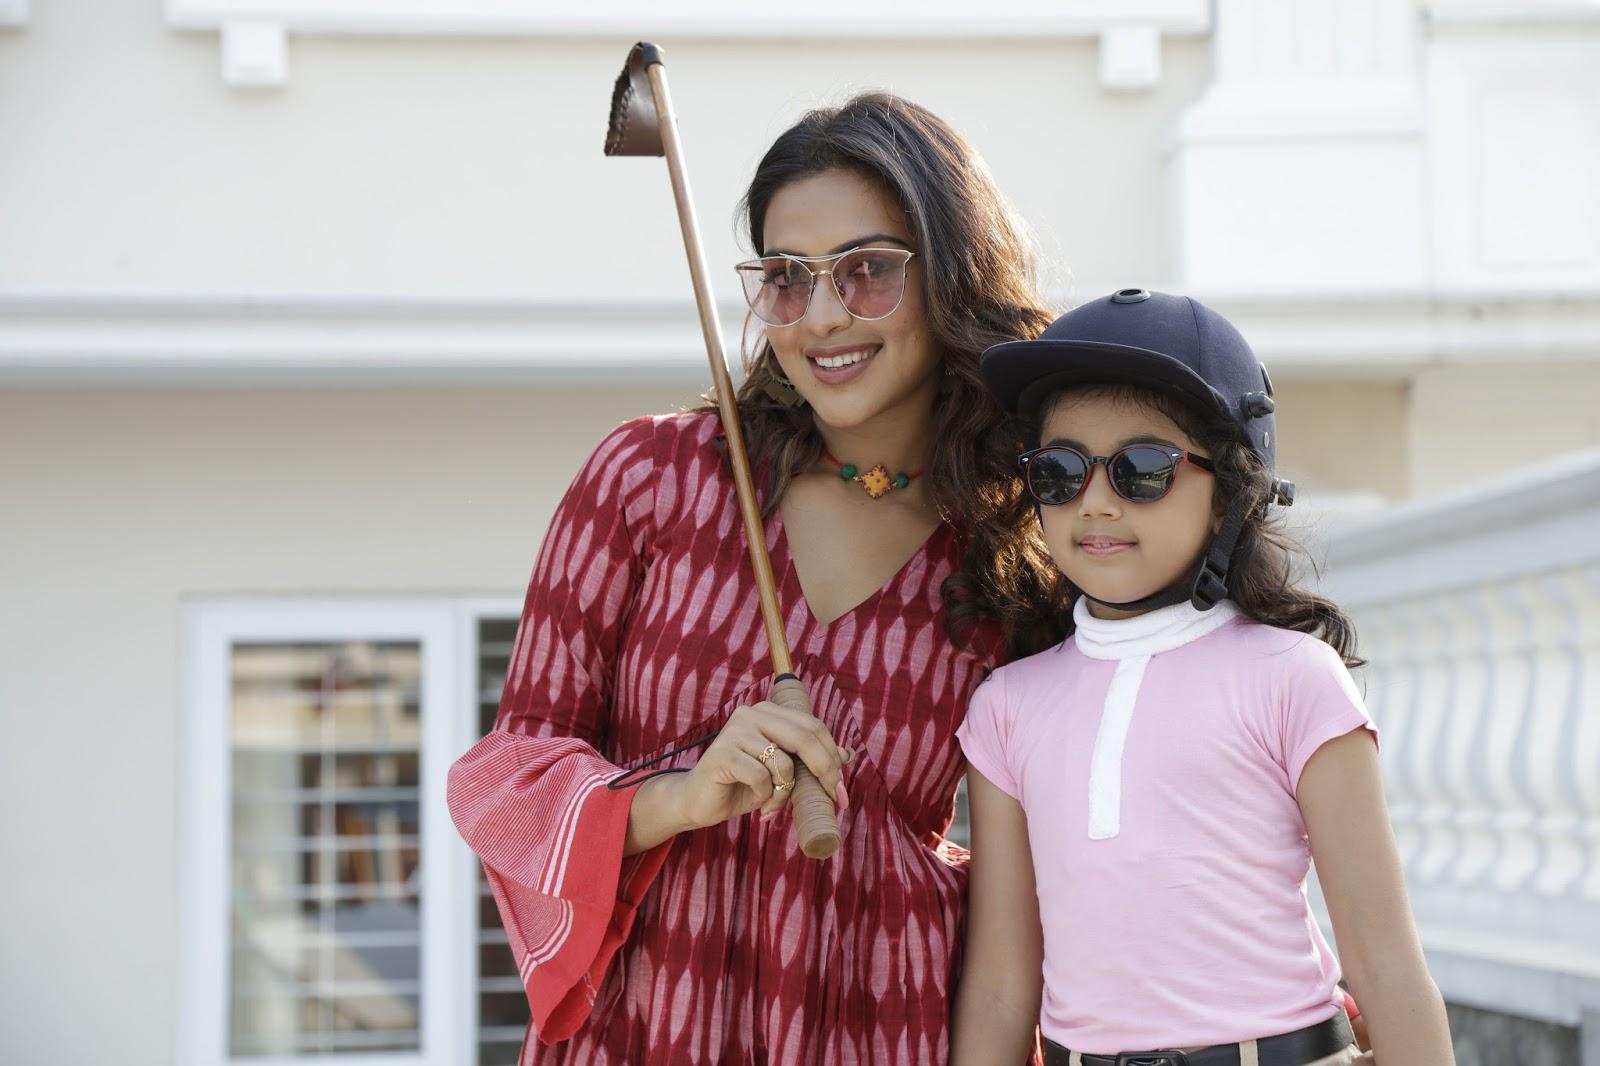 Bhaskar Oru Rascal Movie Photos Tamilnext